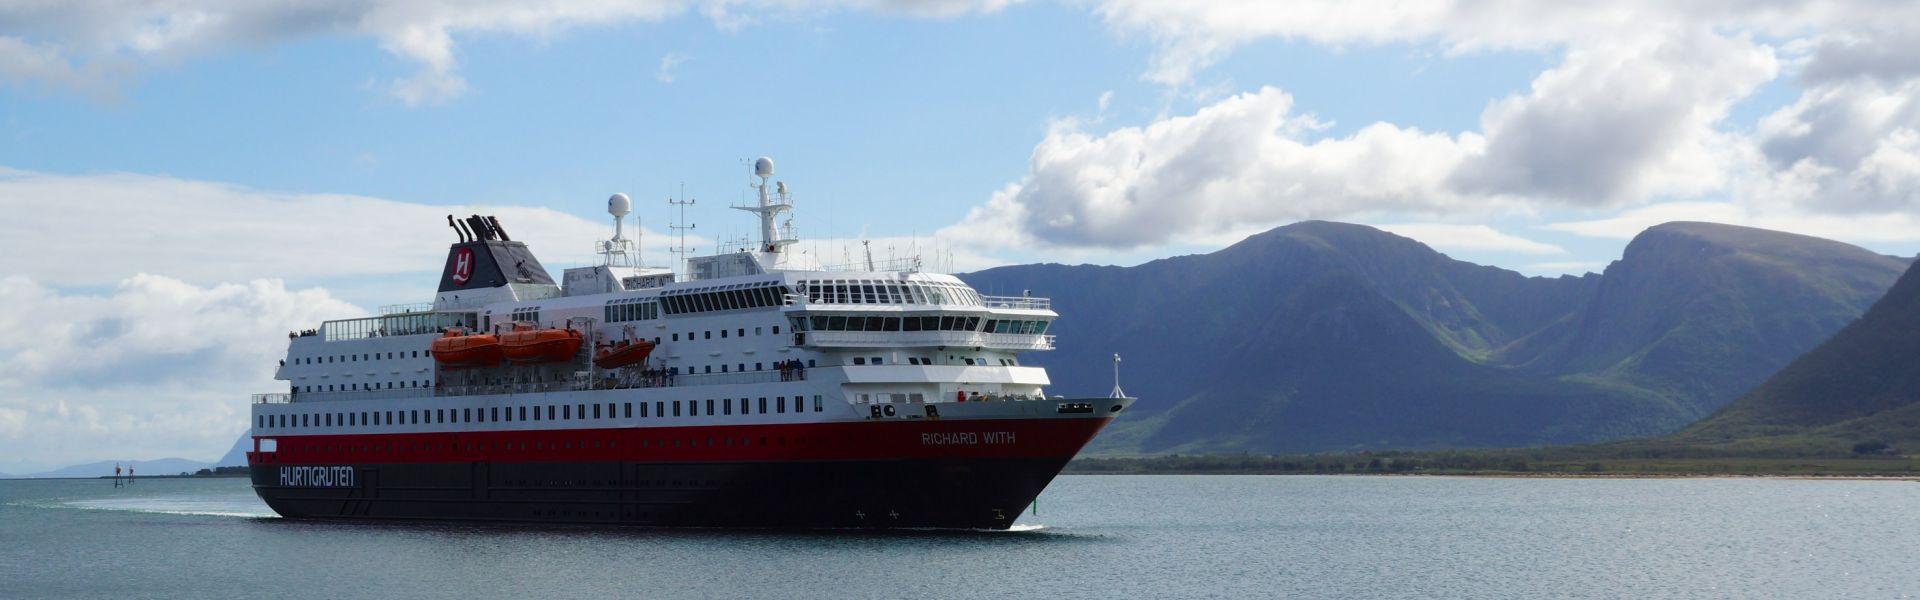 Croaziera 2017 - Scandinavia si Fiordurile Norvegiene (Kirkenes) - Hurtigruten - MS Richard With - 5 nopti